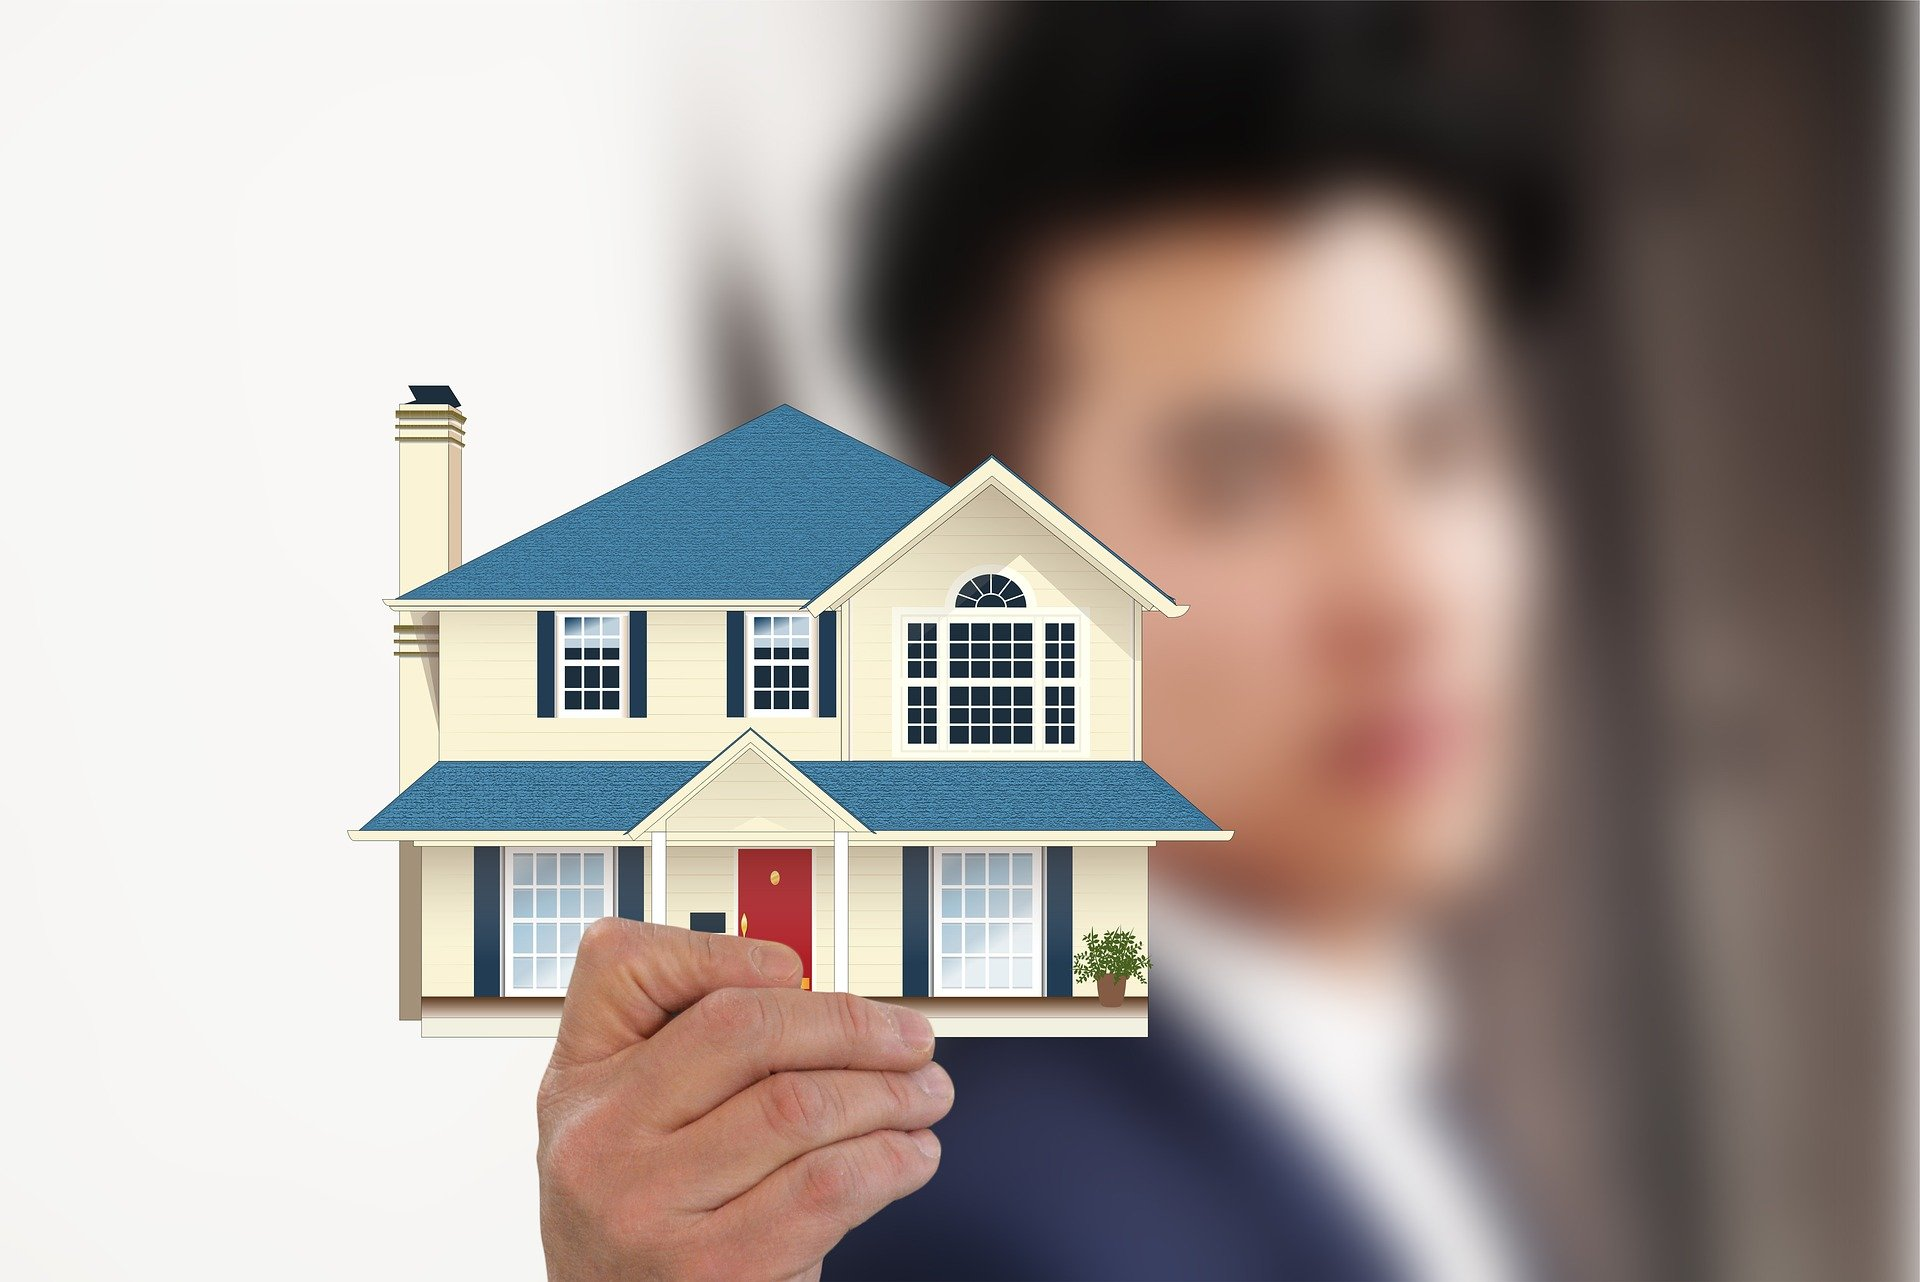 huda affordable housing scheme grugaon